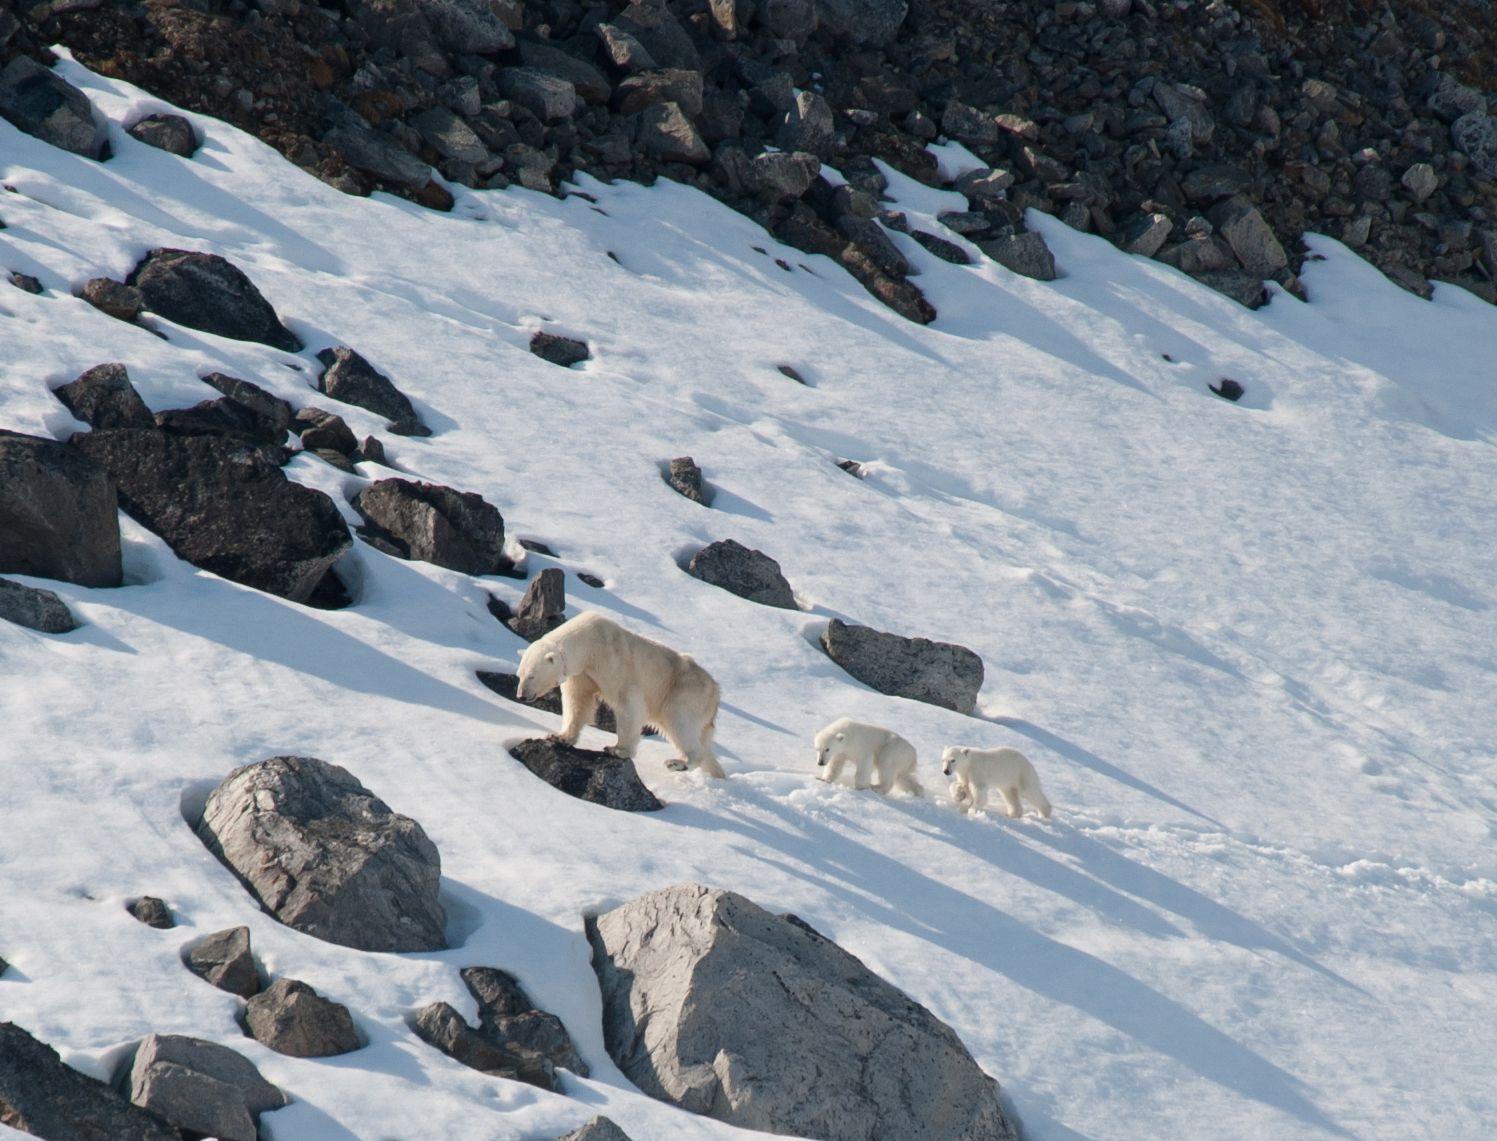 A Polar bear with its cubs in Spitsbergen. Polar bear